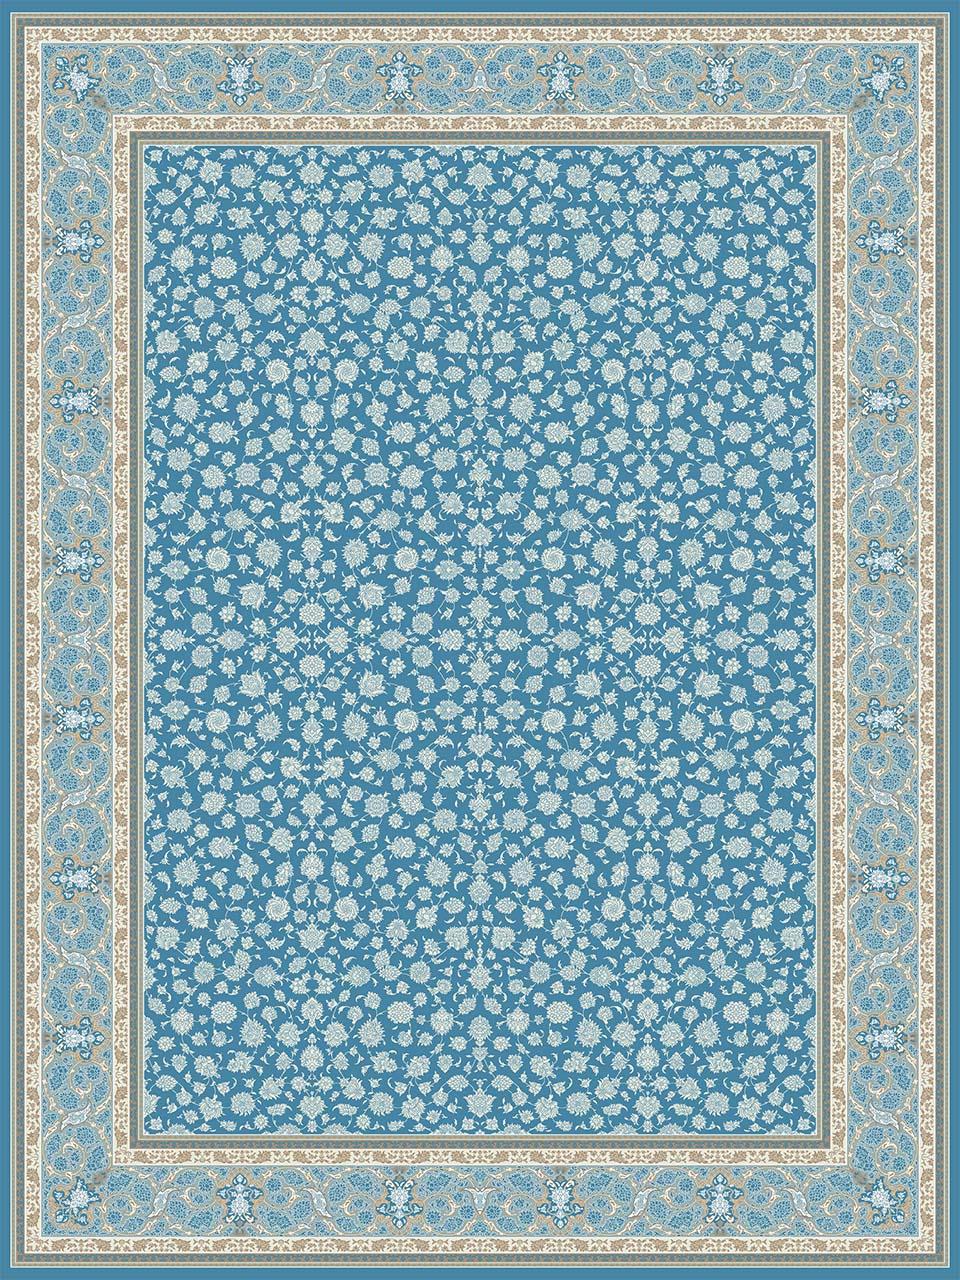 فرش (26003) اکریلیک - 8 رنگ - 700 شانه - آبي تيره - تراکم 2550